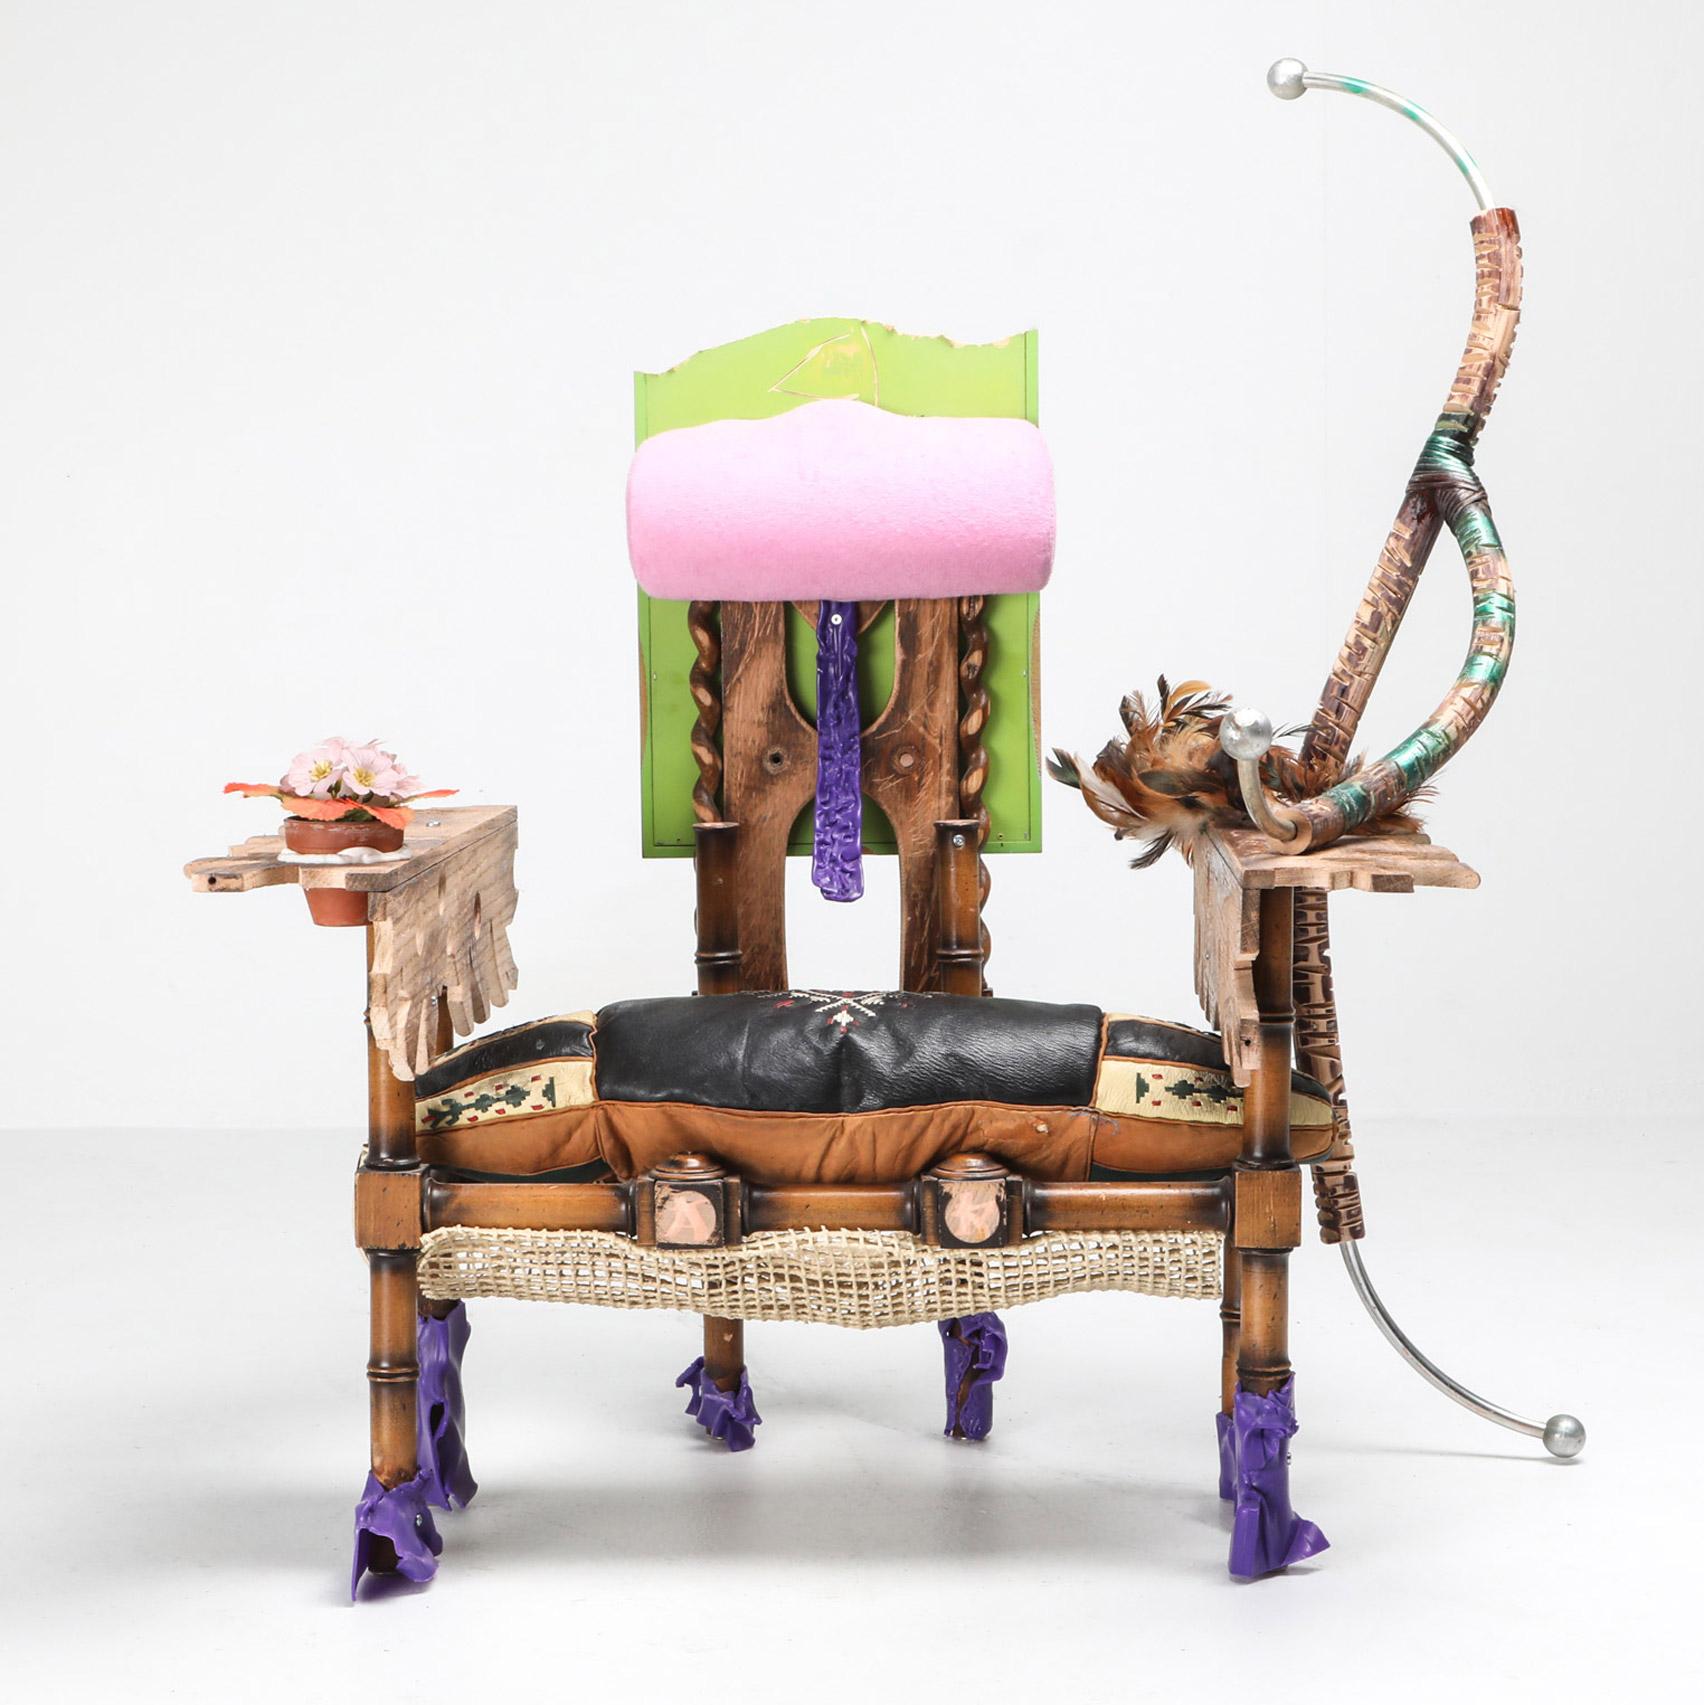 everyday-gallery-messgewand-romain-coppin-alexis-bondoux-furniture-design-sq-1